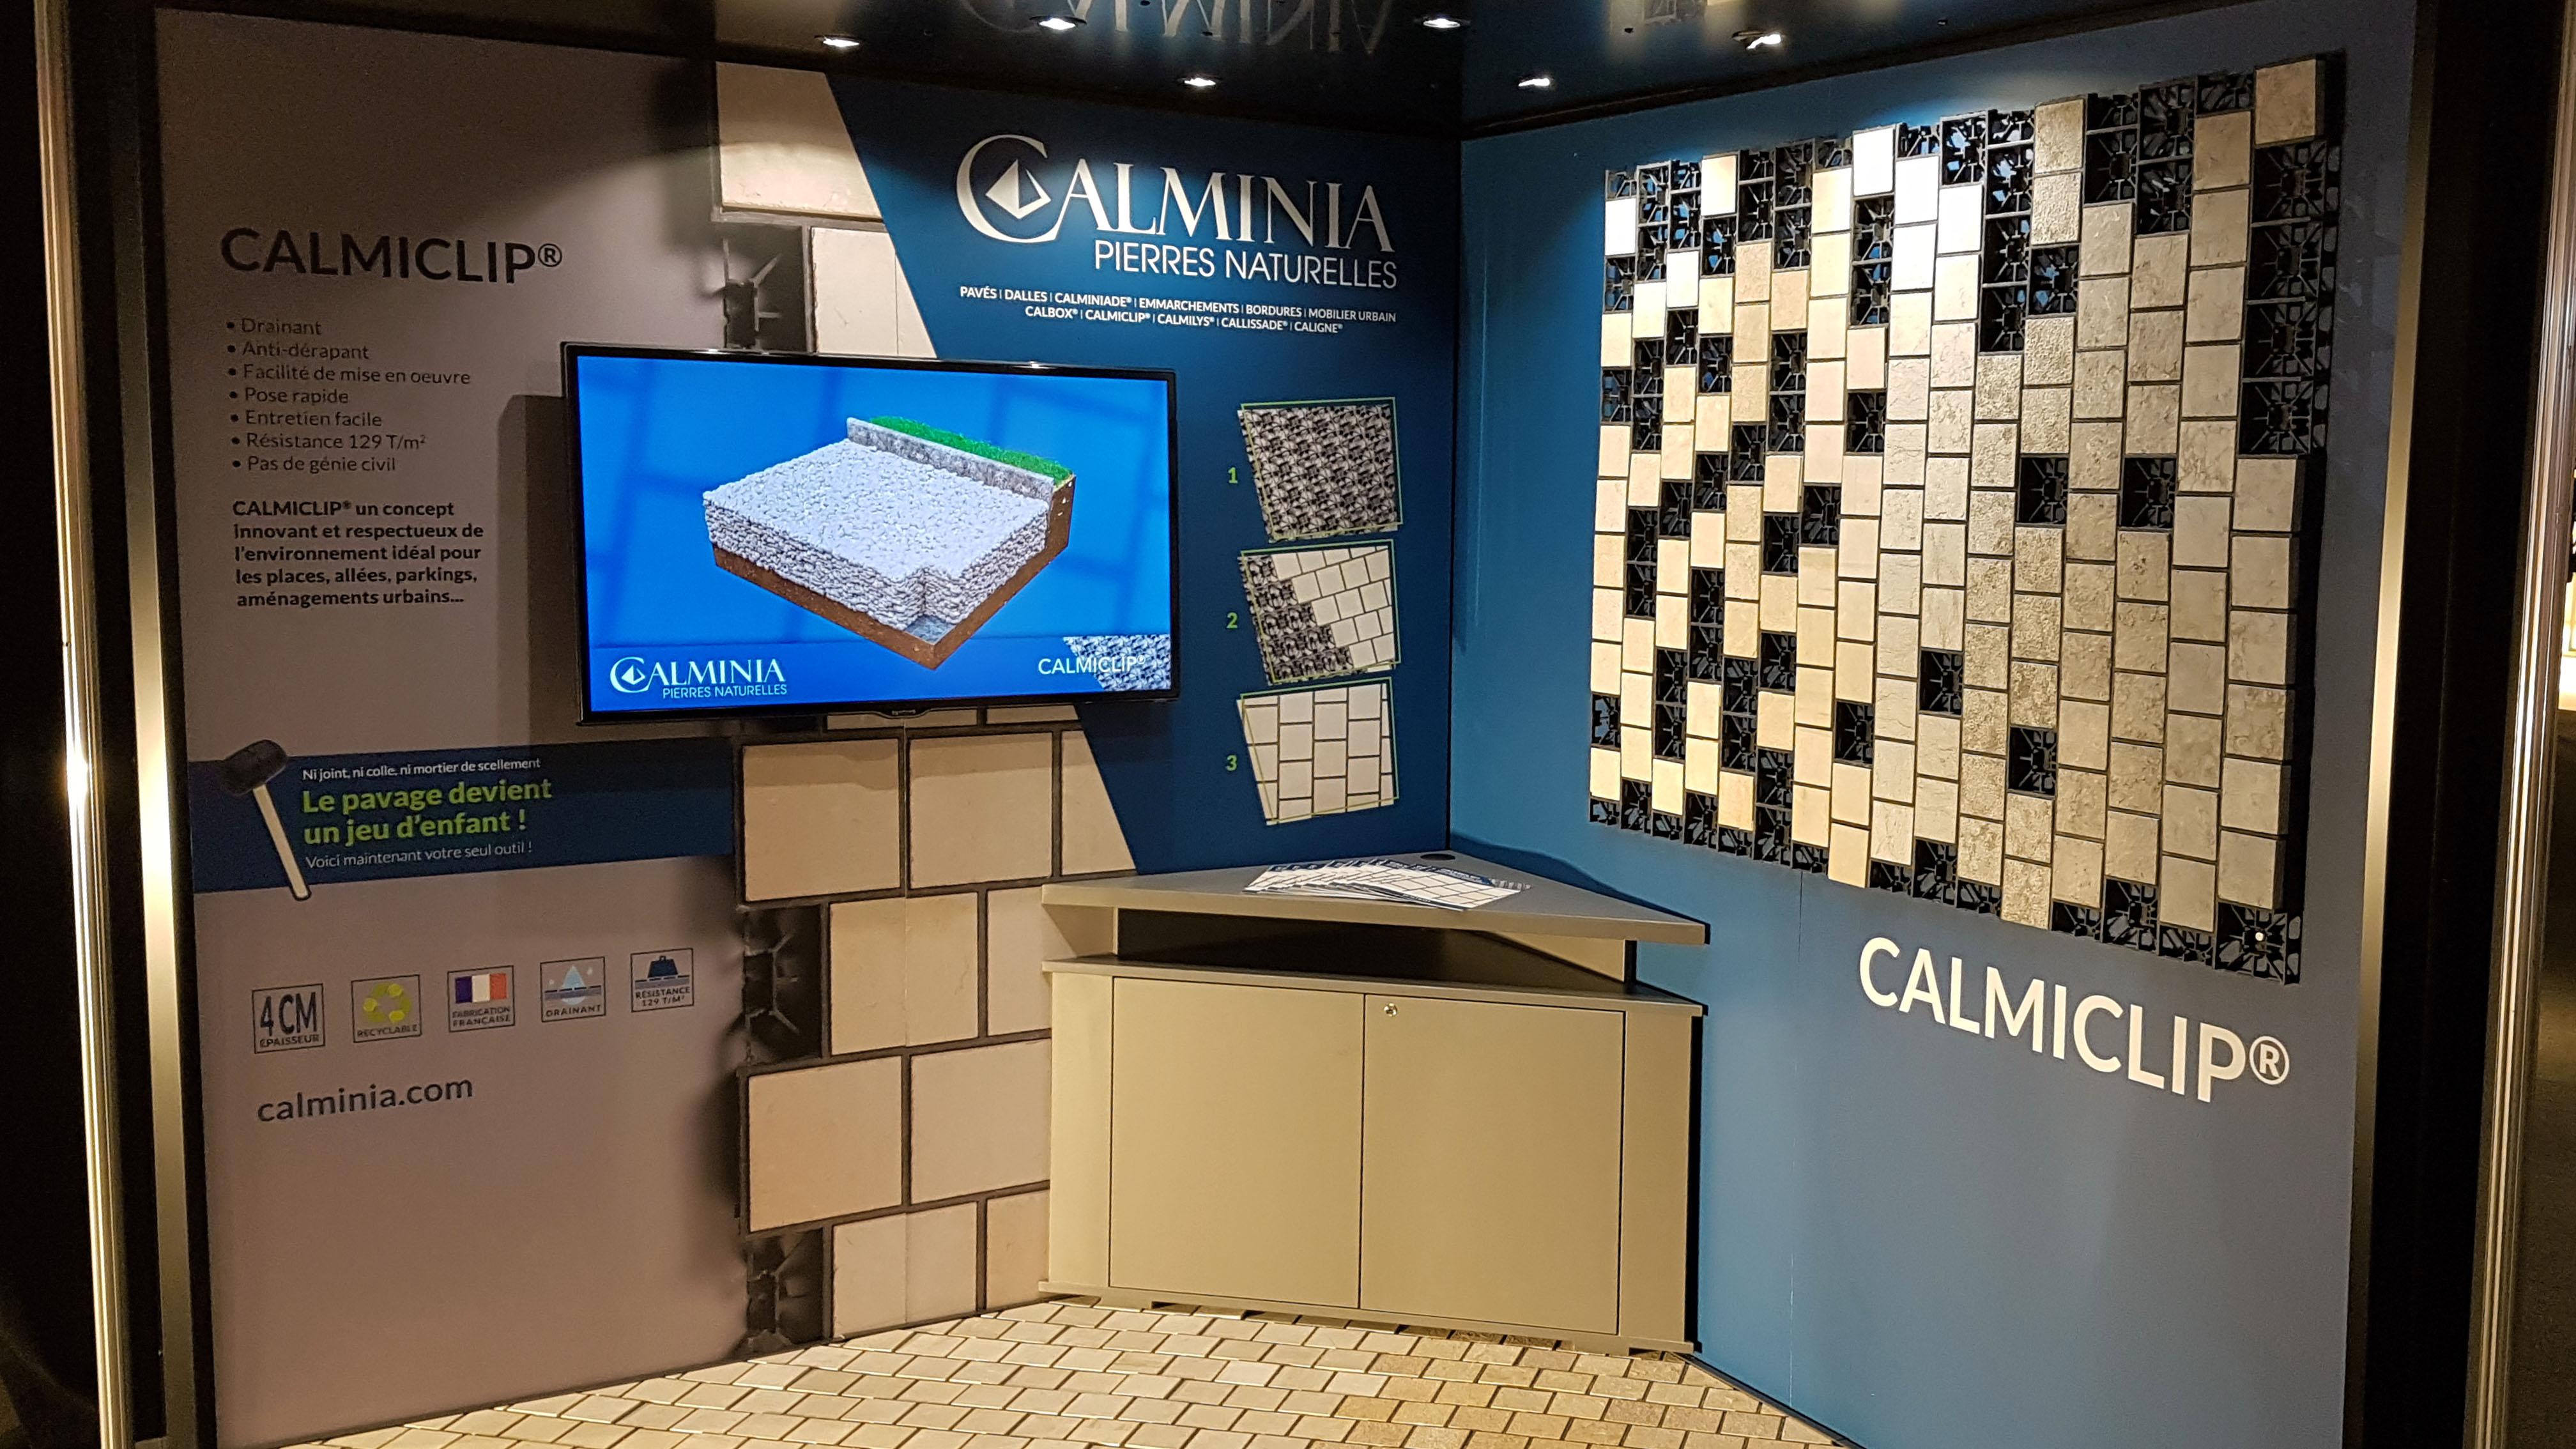 actu-salon-architect-at-work-calmiclip-calminia